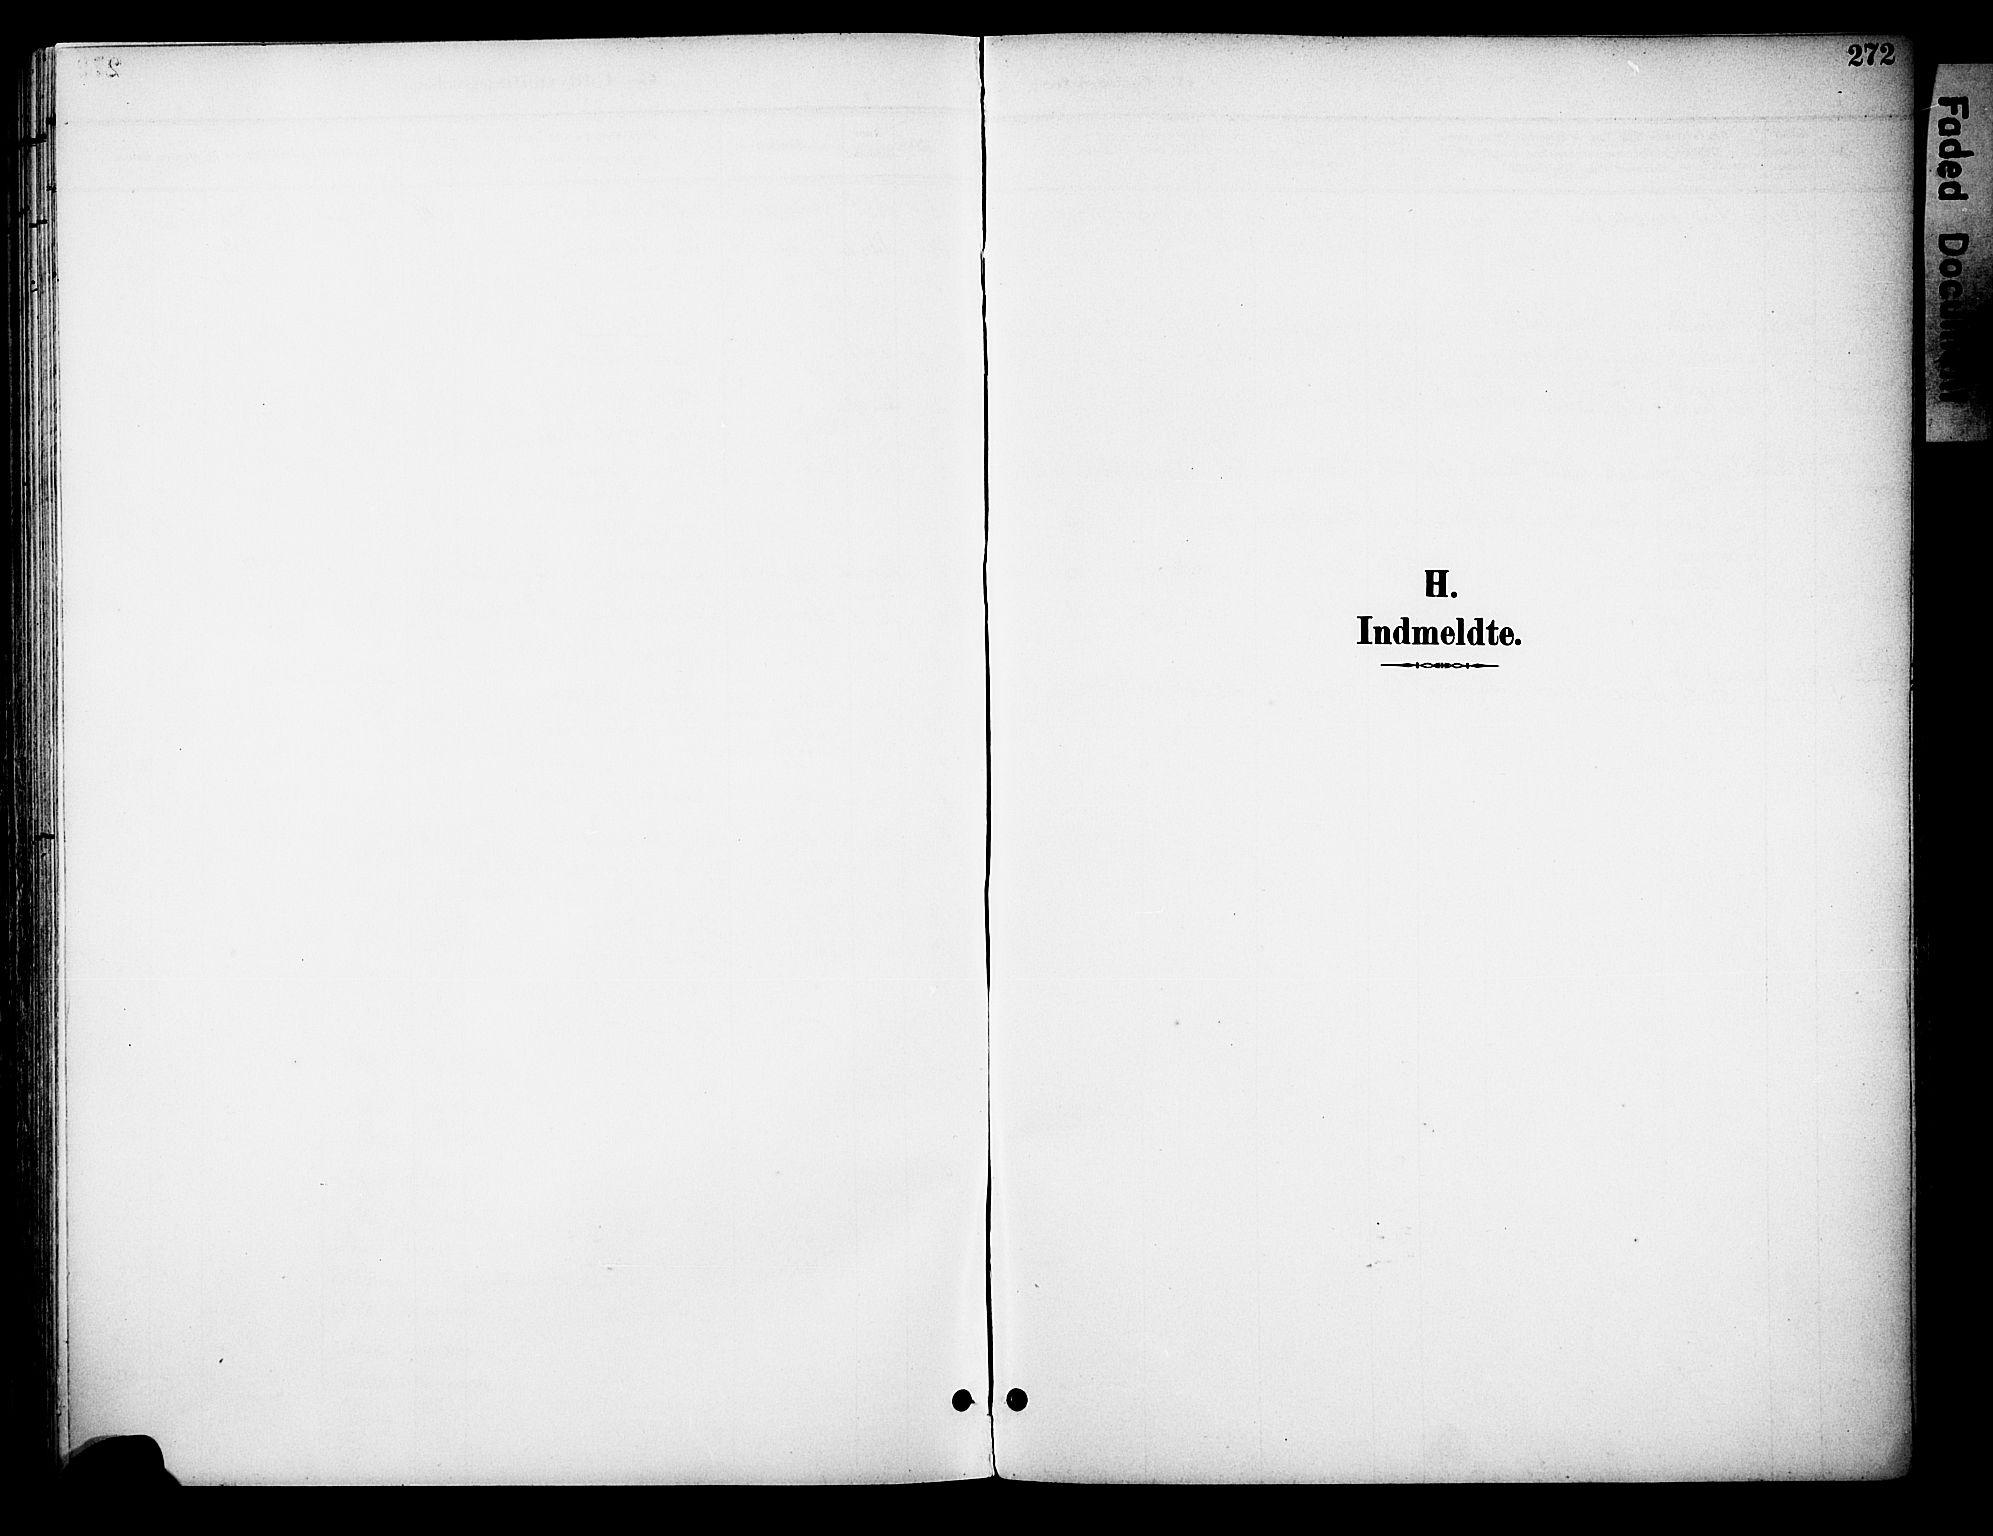 SAH, Østre Toten prestekontor, Ministerialbok nr. 9, 1897-1913, s. 272